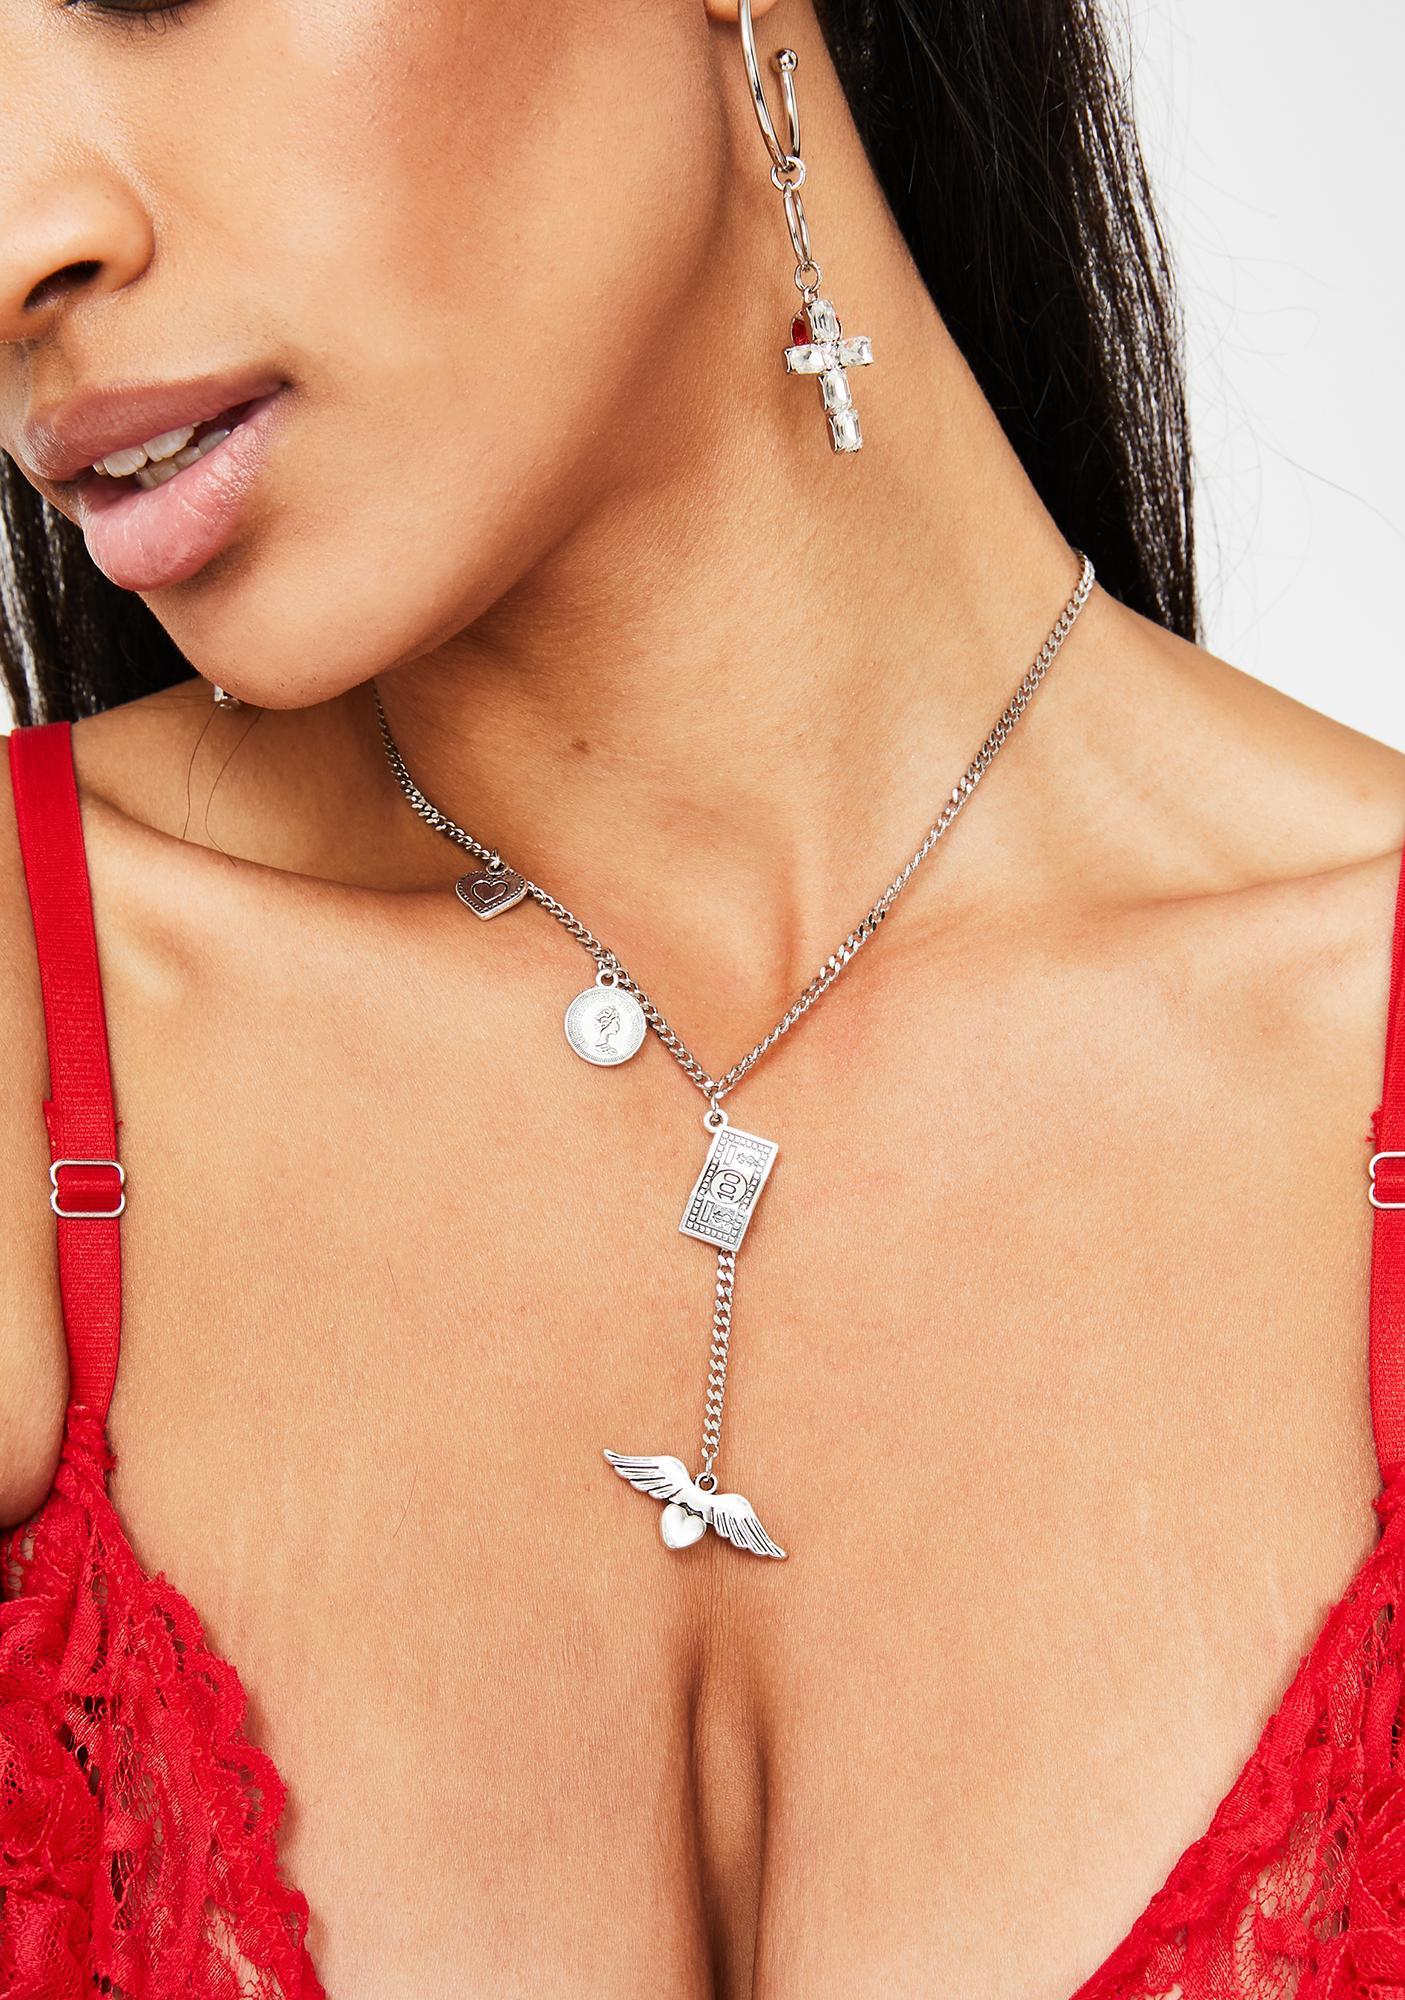 Fantasy Life Charm Necklace